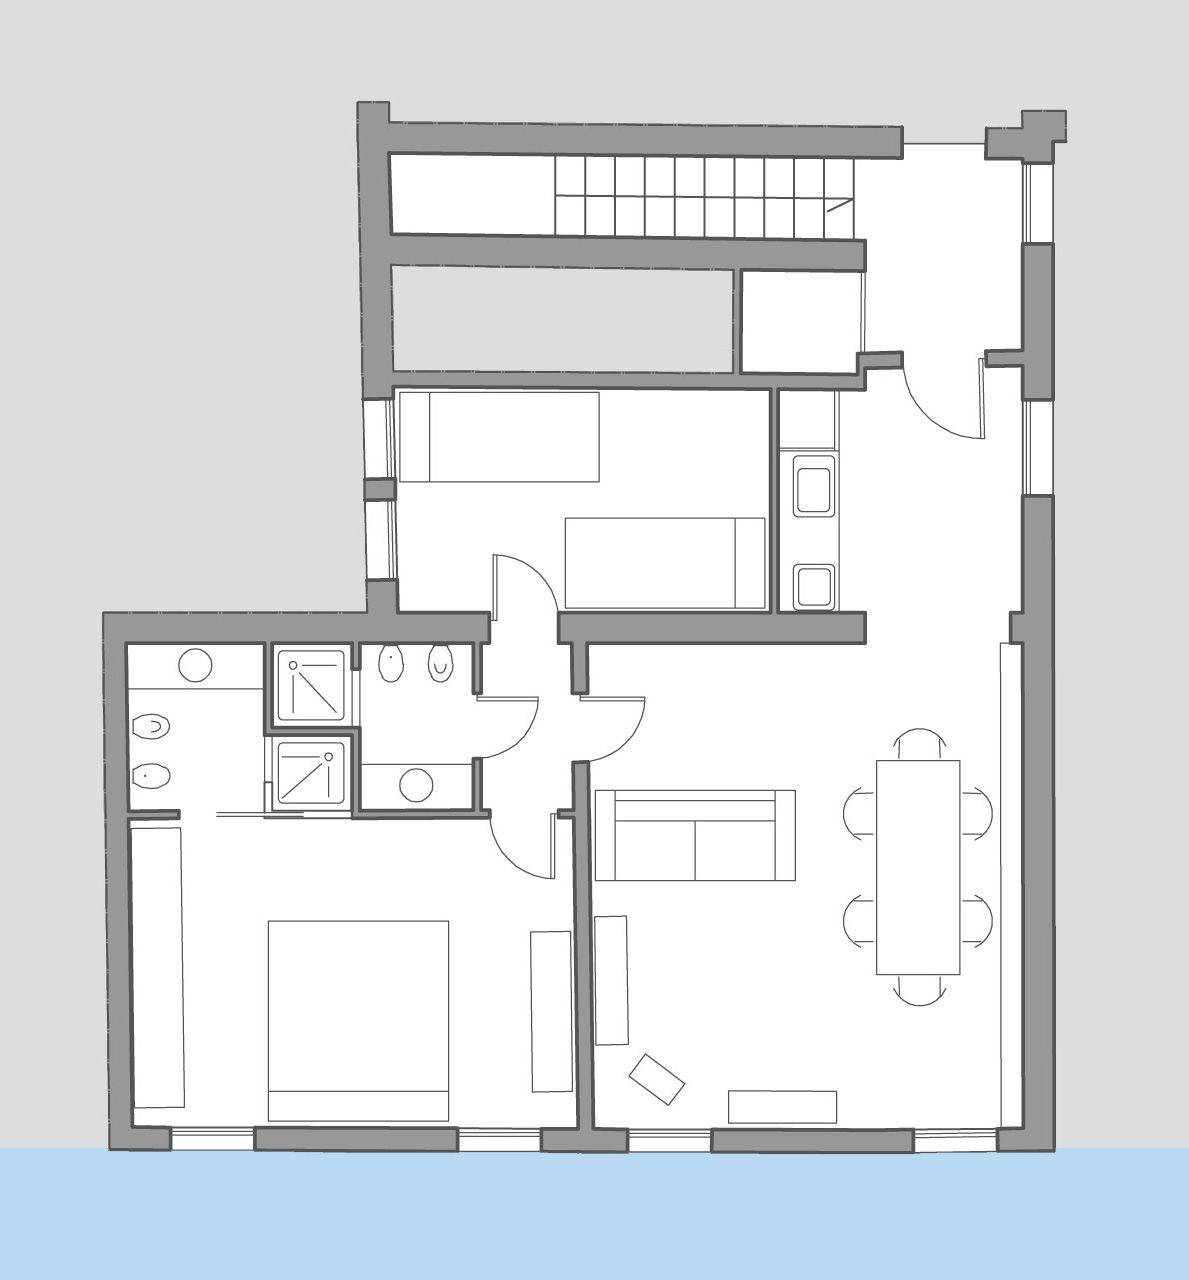 Foscarina floor plan